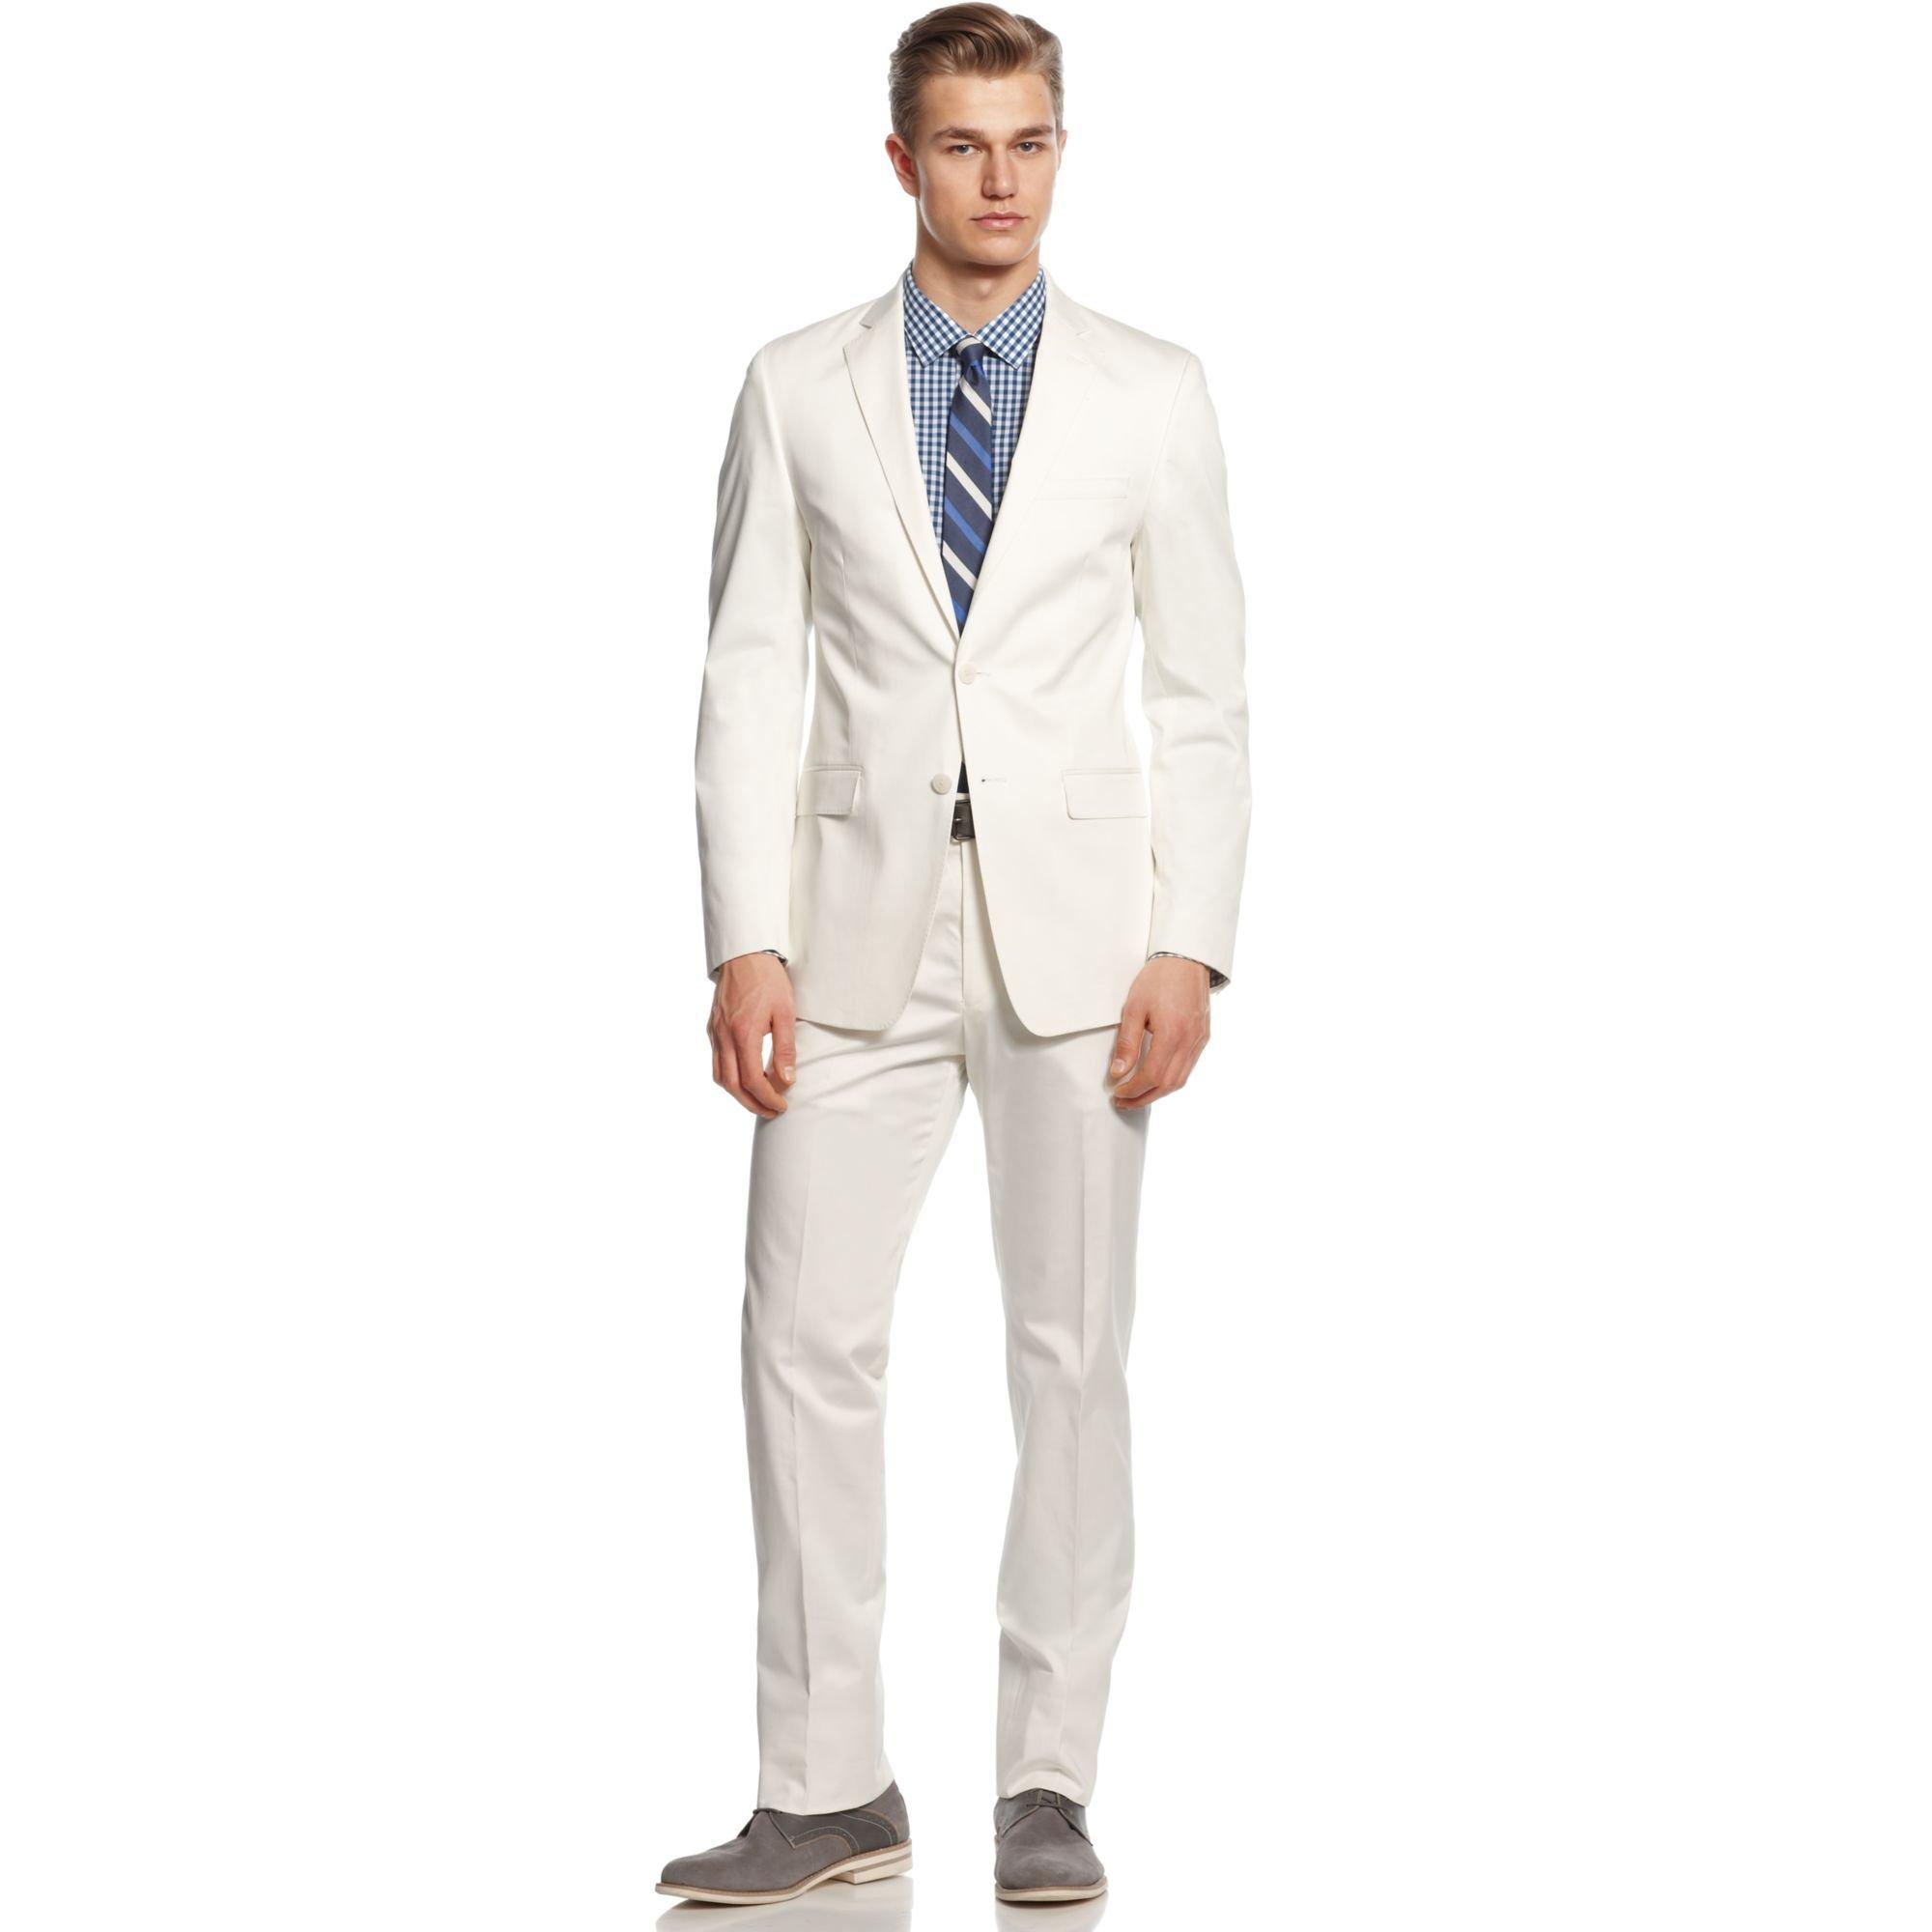 Lyst - Calvin Klein Suit White Cotton Slim Fit in White for Men